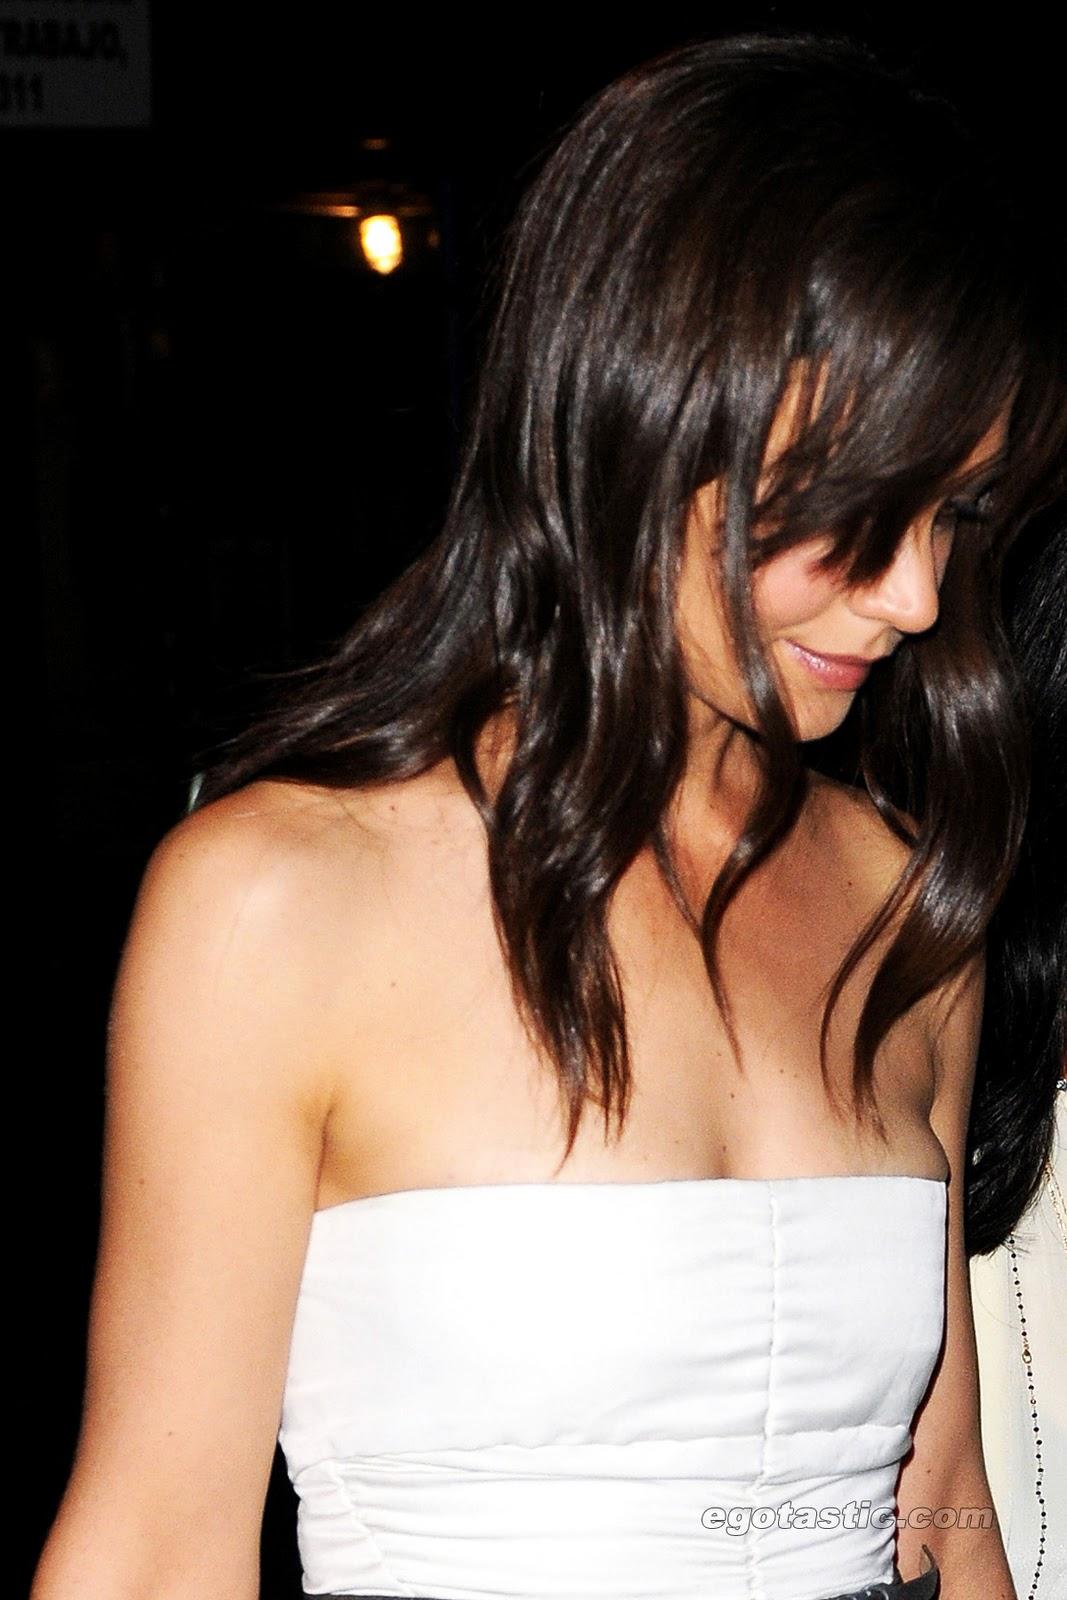 http://4.bp.blogspot.com/_WDCWEjl45FQ/TOb-CCuKcwI/AAAAAAAAAU4/7RaxCOPJXyM/s1600/katie-holmes-white-dress-cleavage-03.jpg